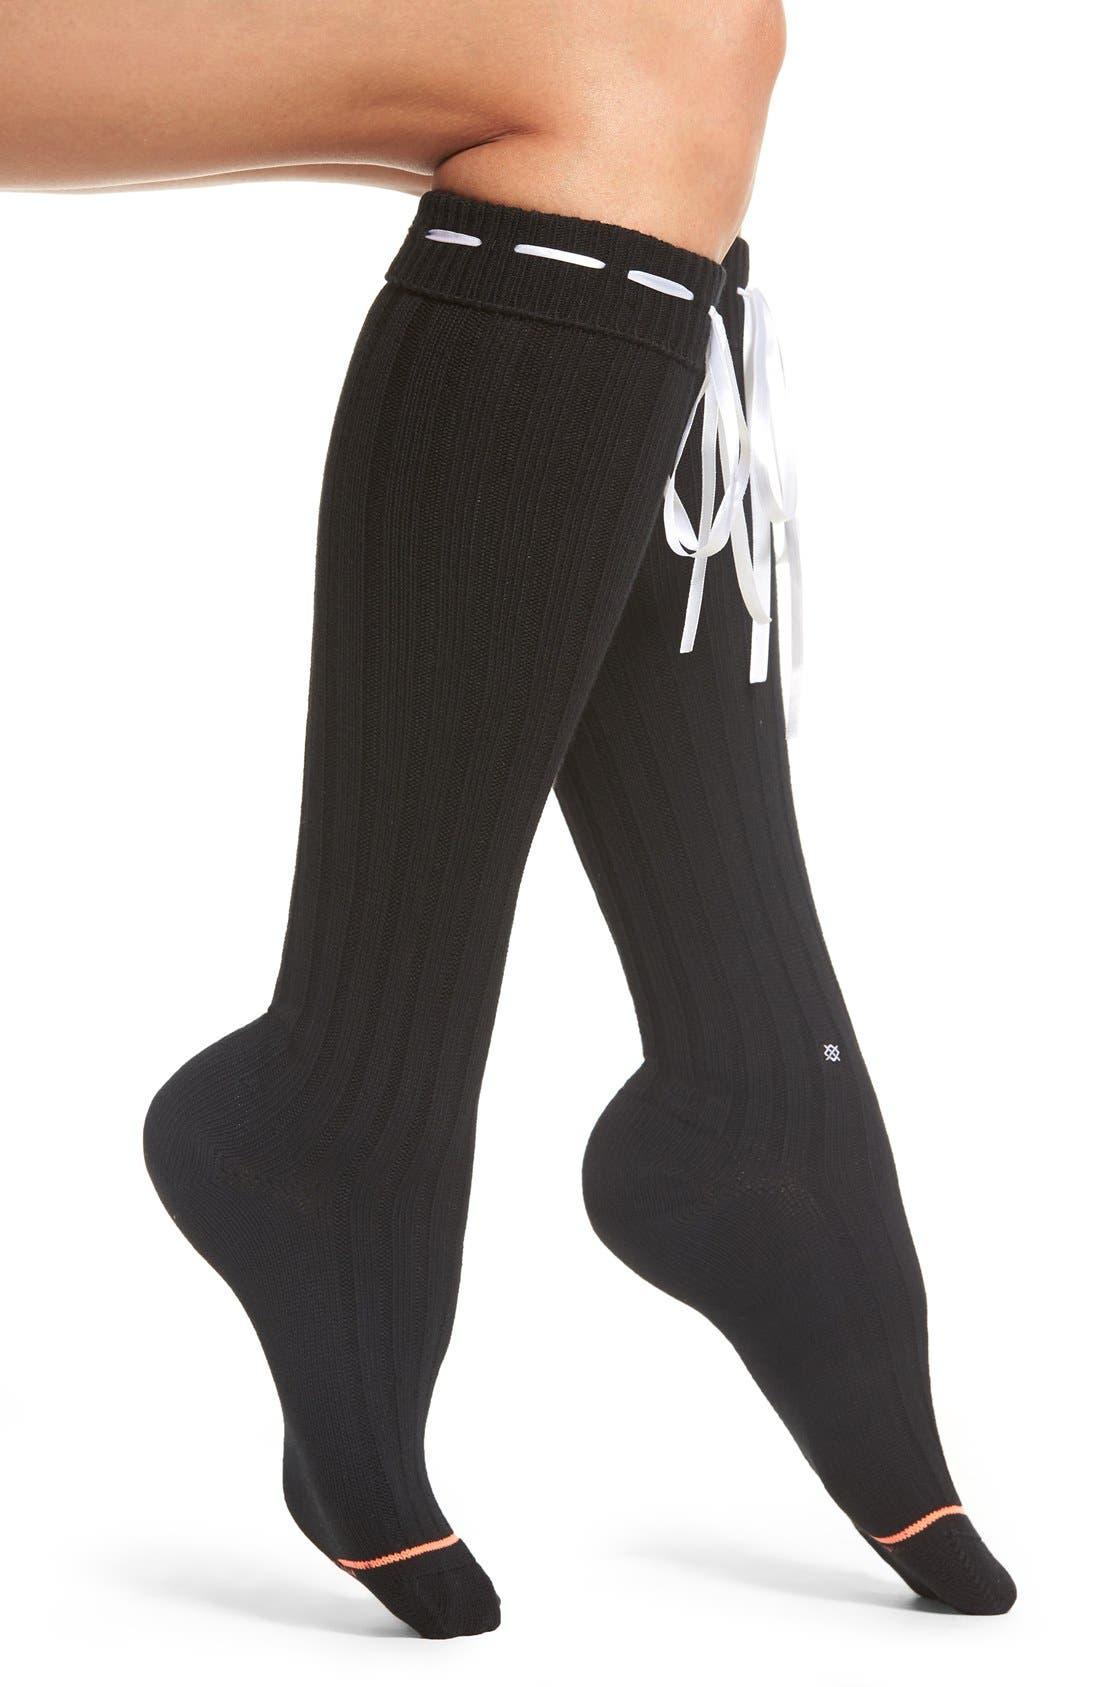 Alternate Image 1 Selected - Stance Dolores Knee High Socks